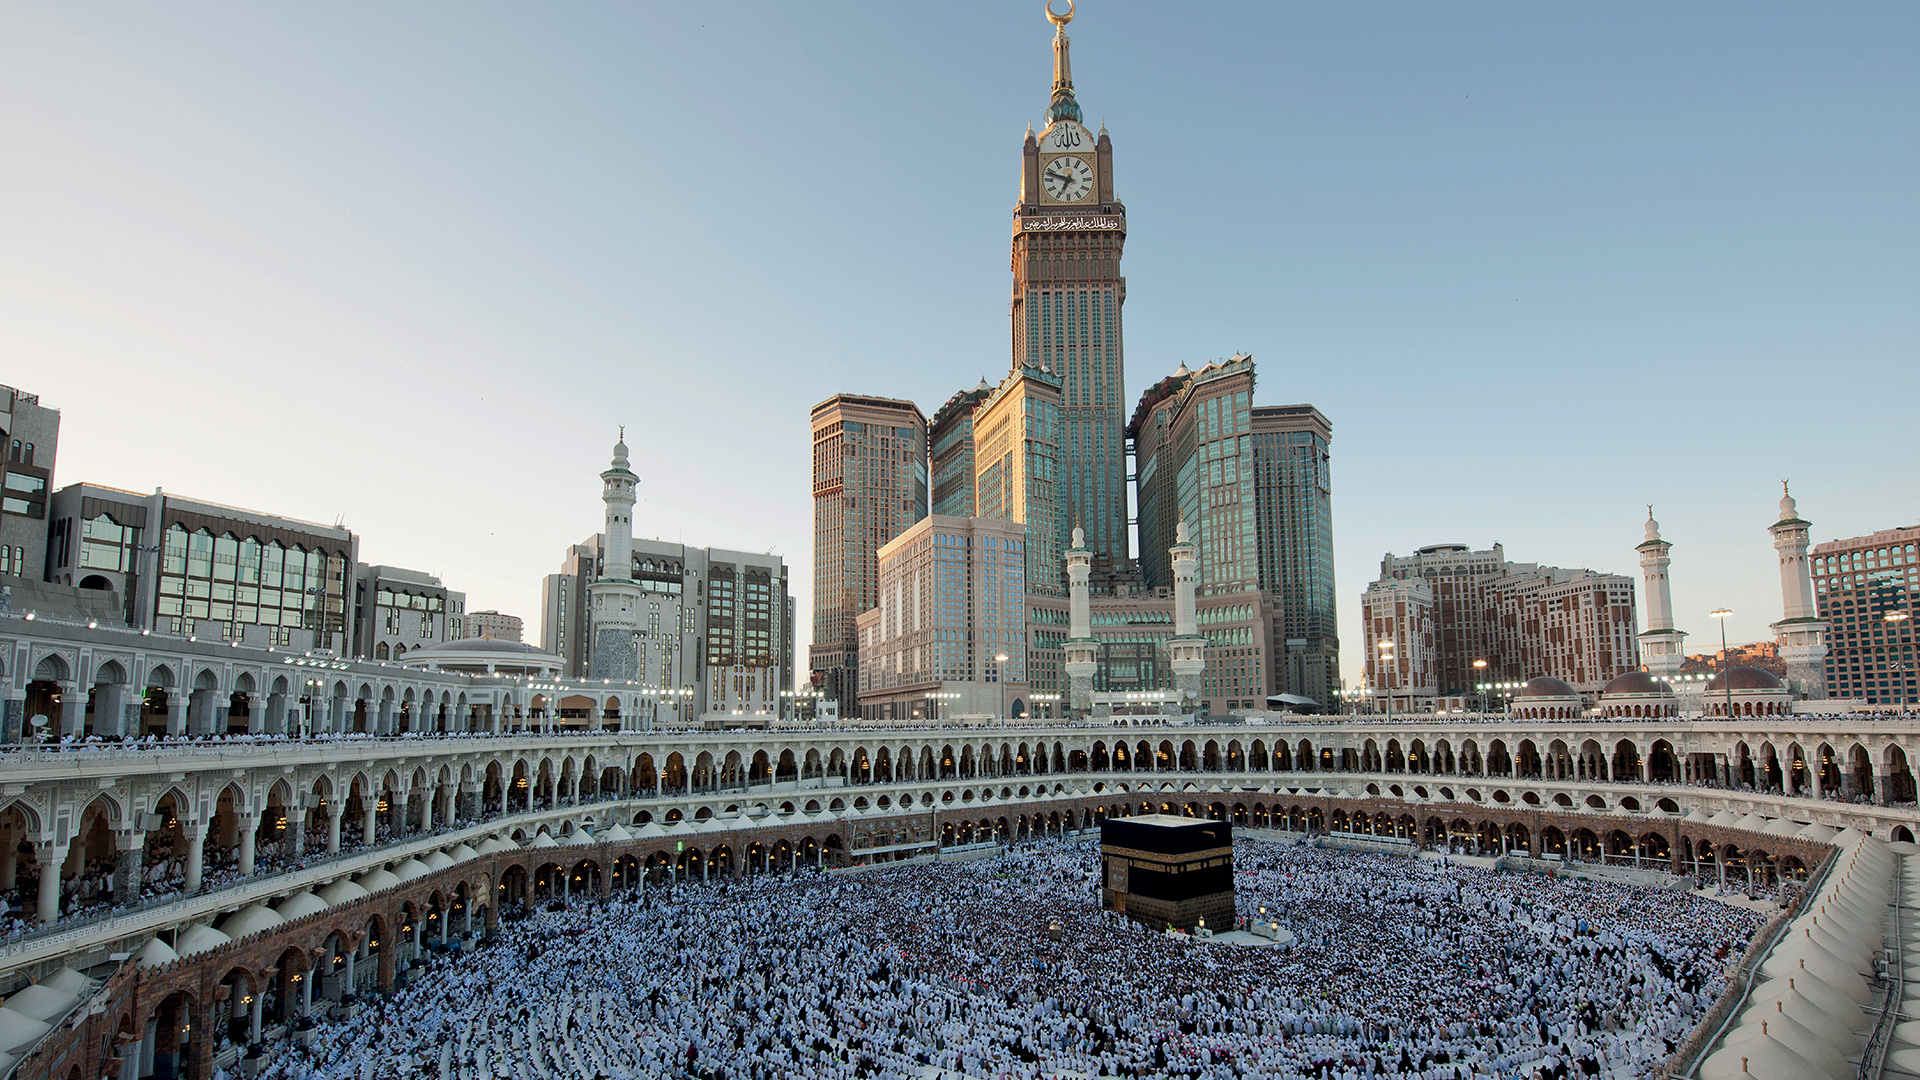 Makkah Royal Clock Tower | ProTenders